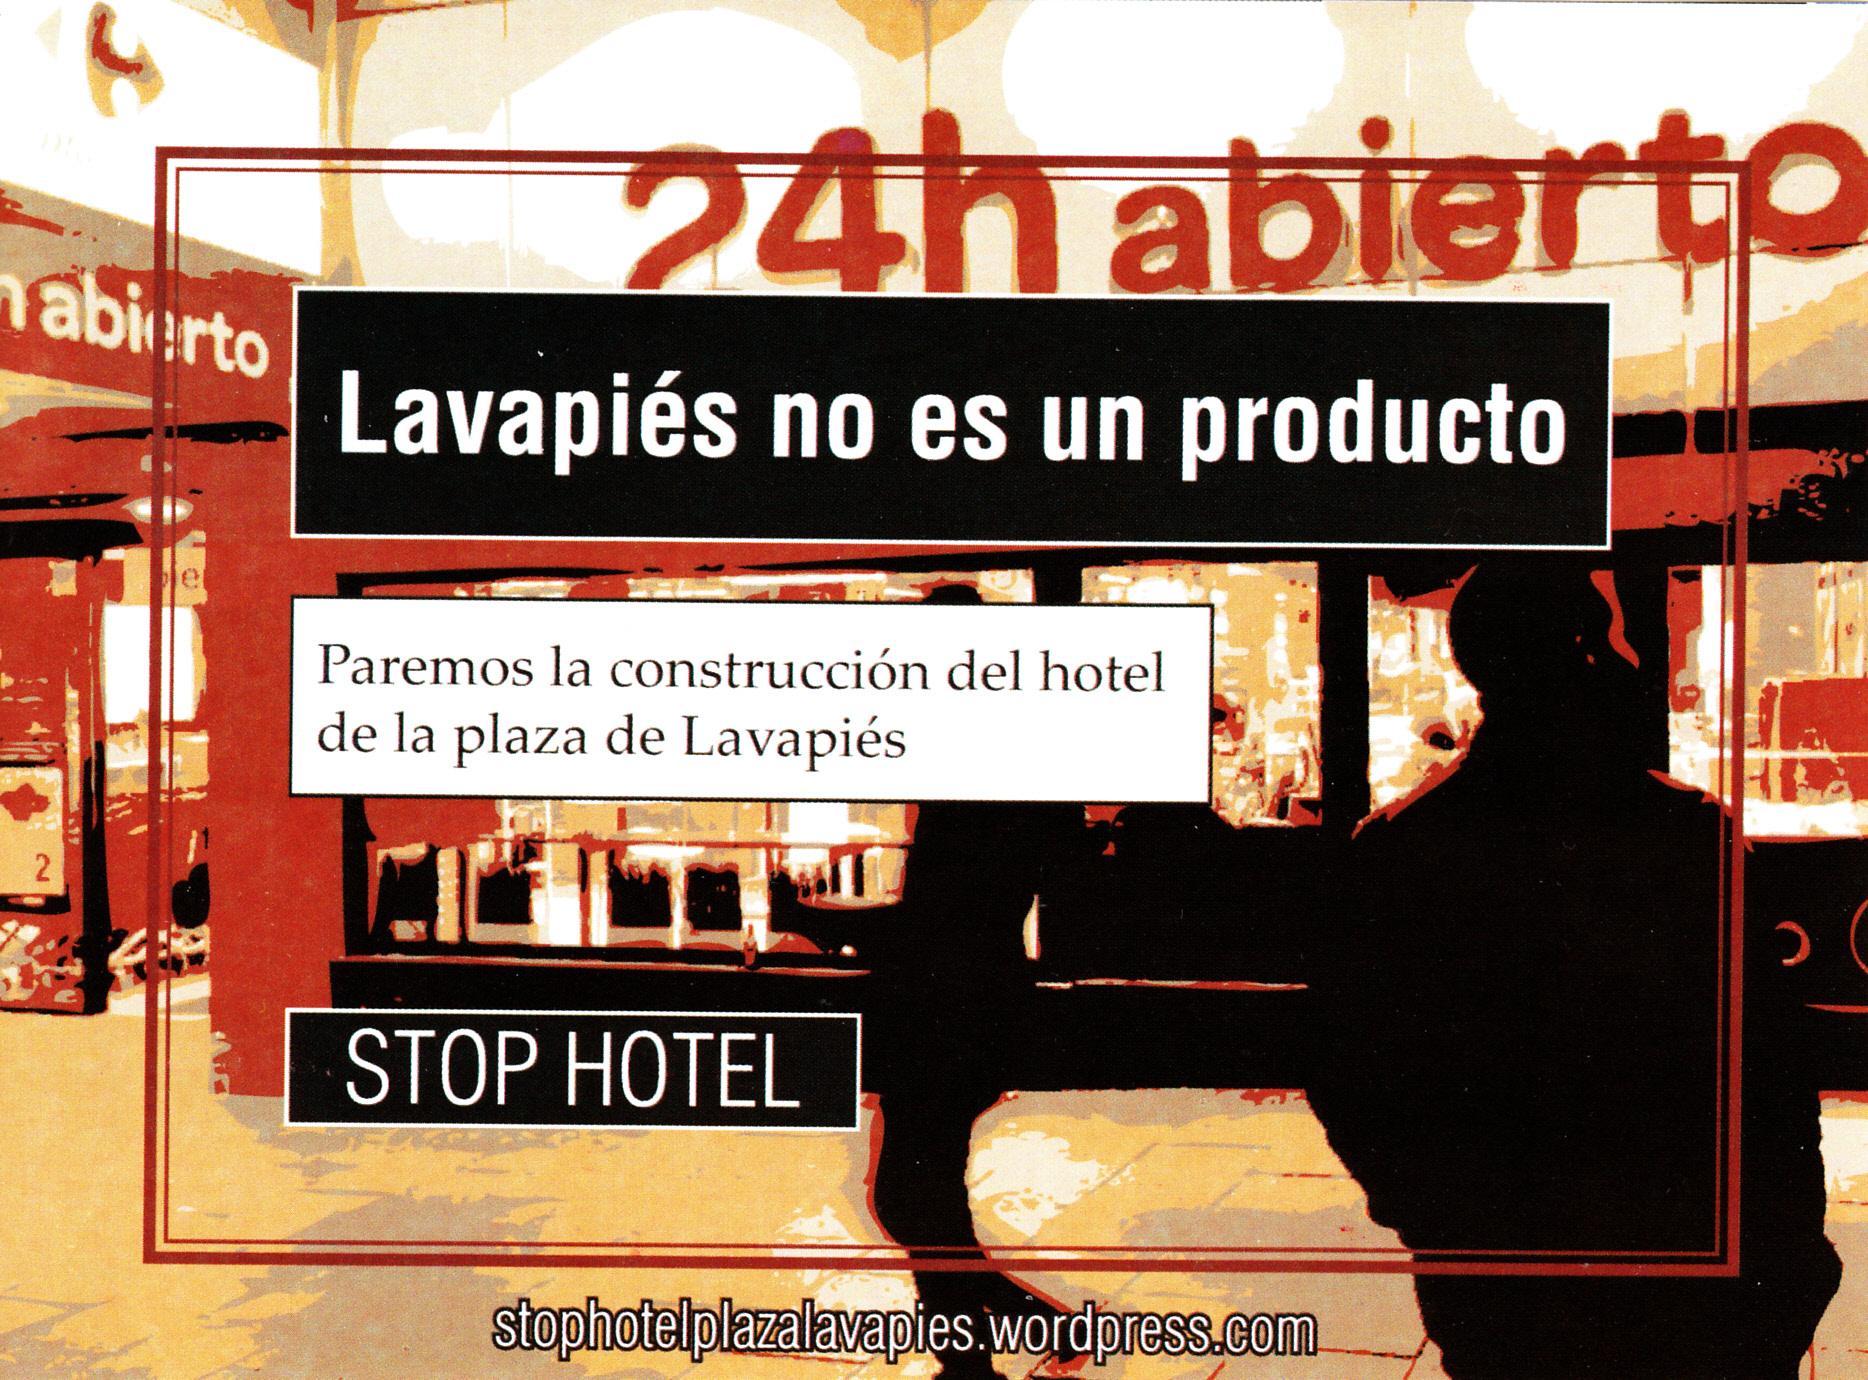 Stop hotel_autoc_0002